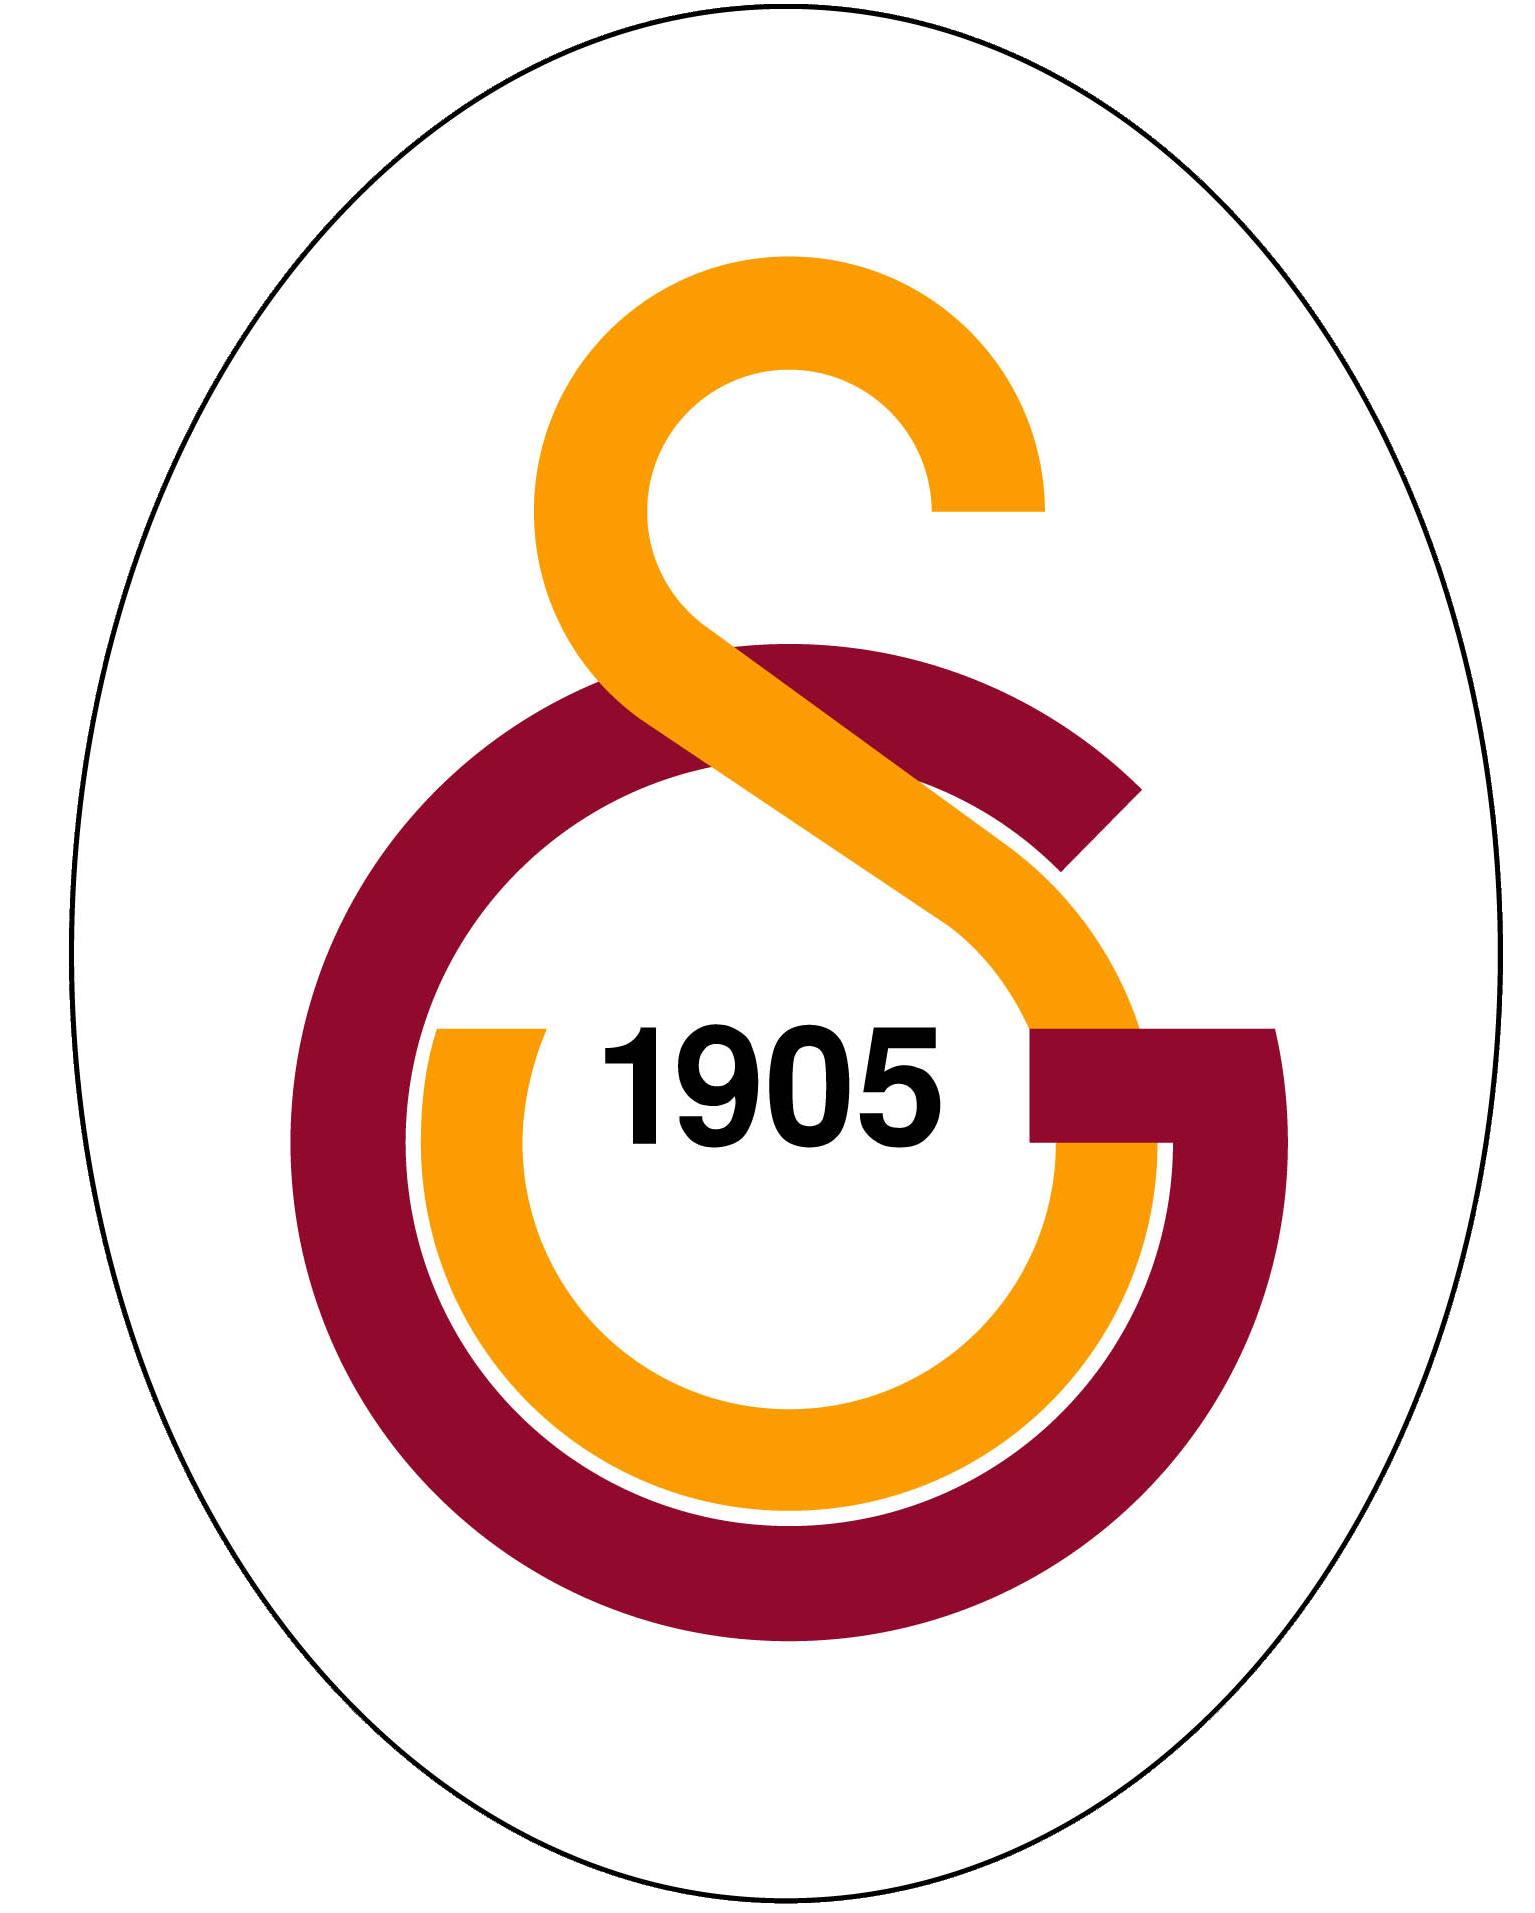 File:Galatasaray Sports Club Logo.png.